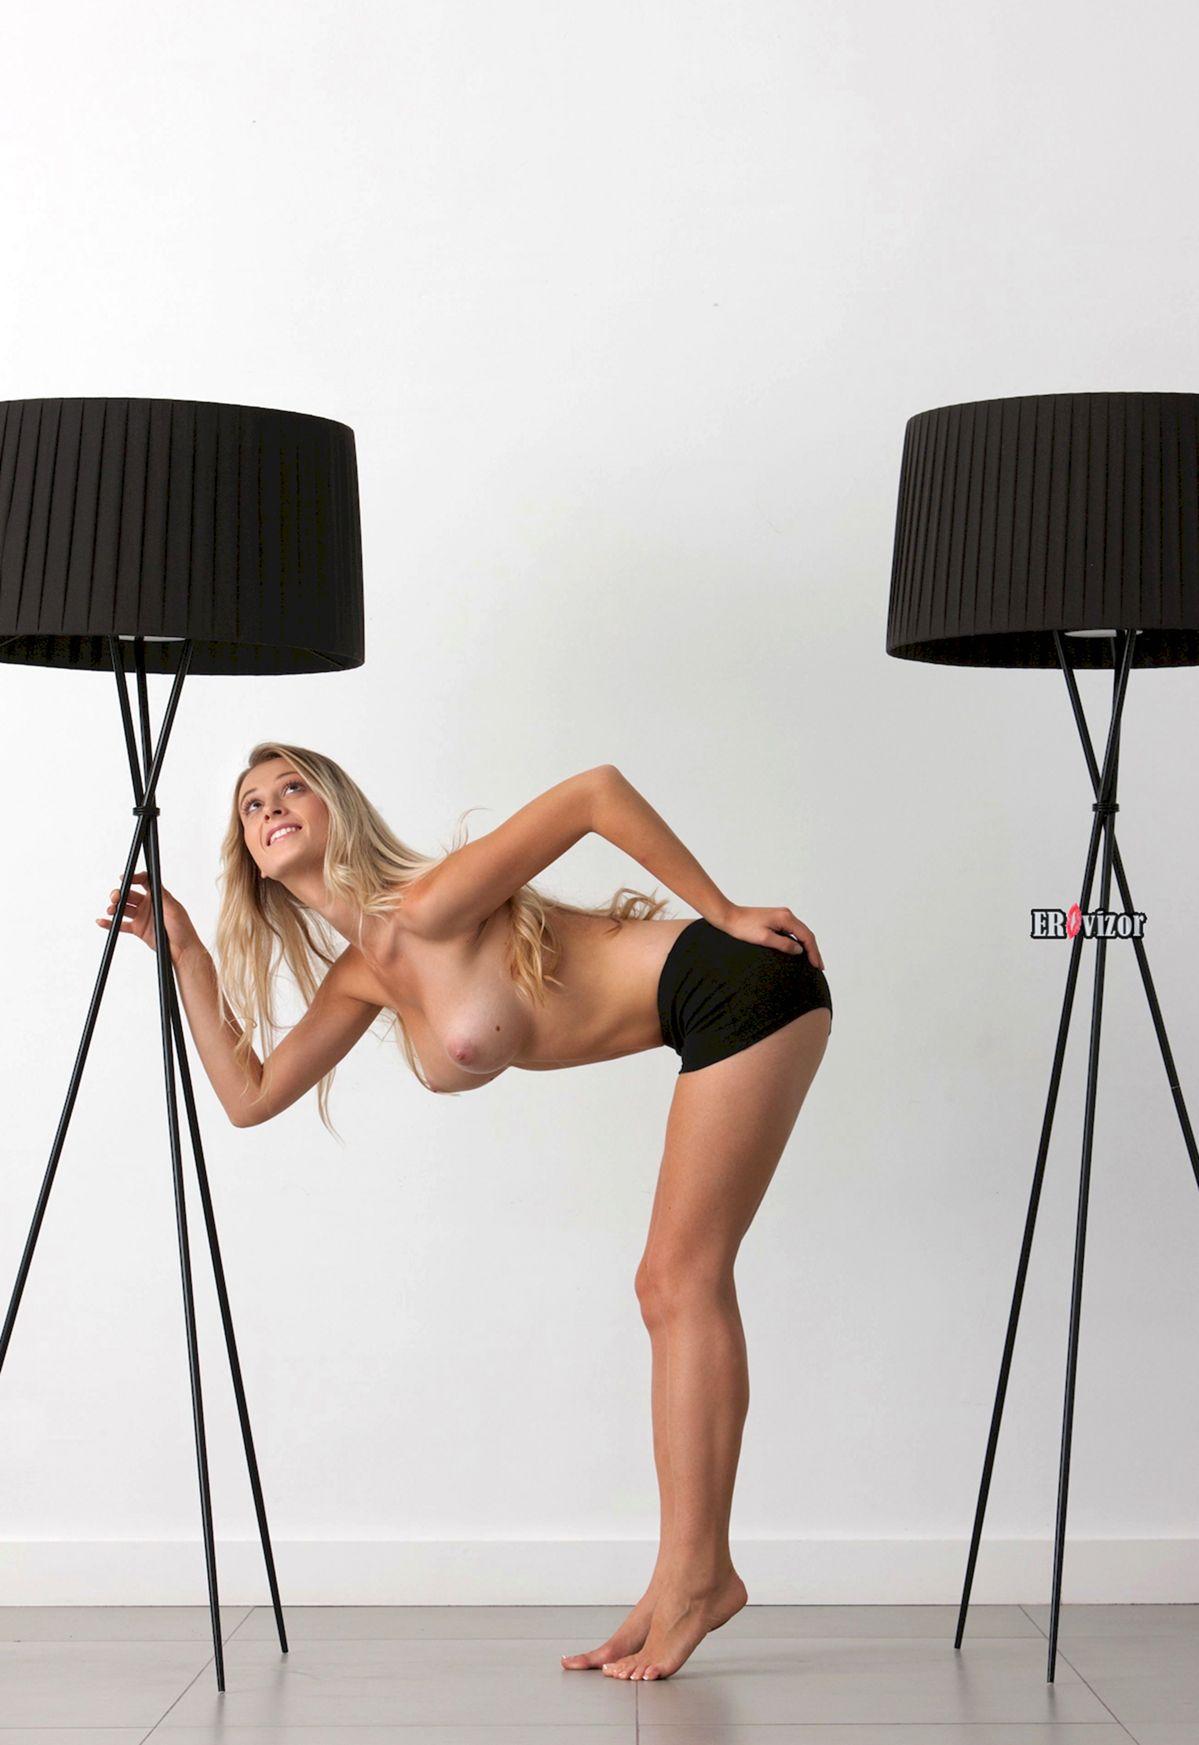 Blonde-Babe-Carisha-with-Big-Tits (1)